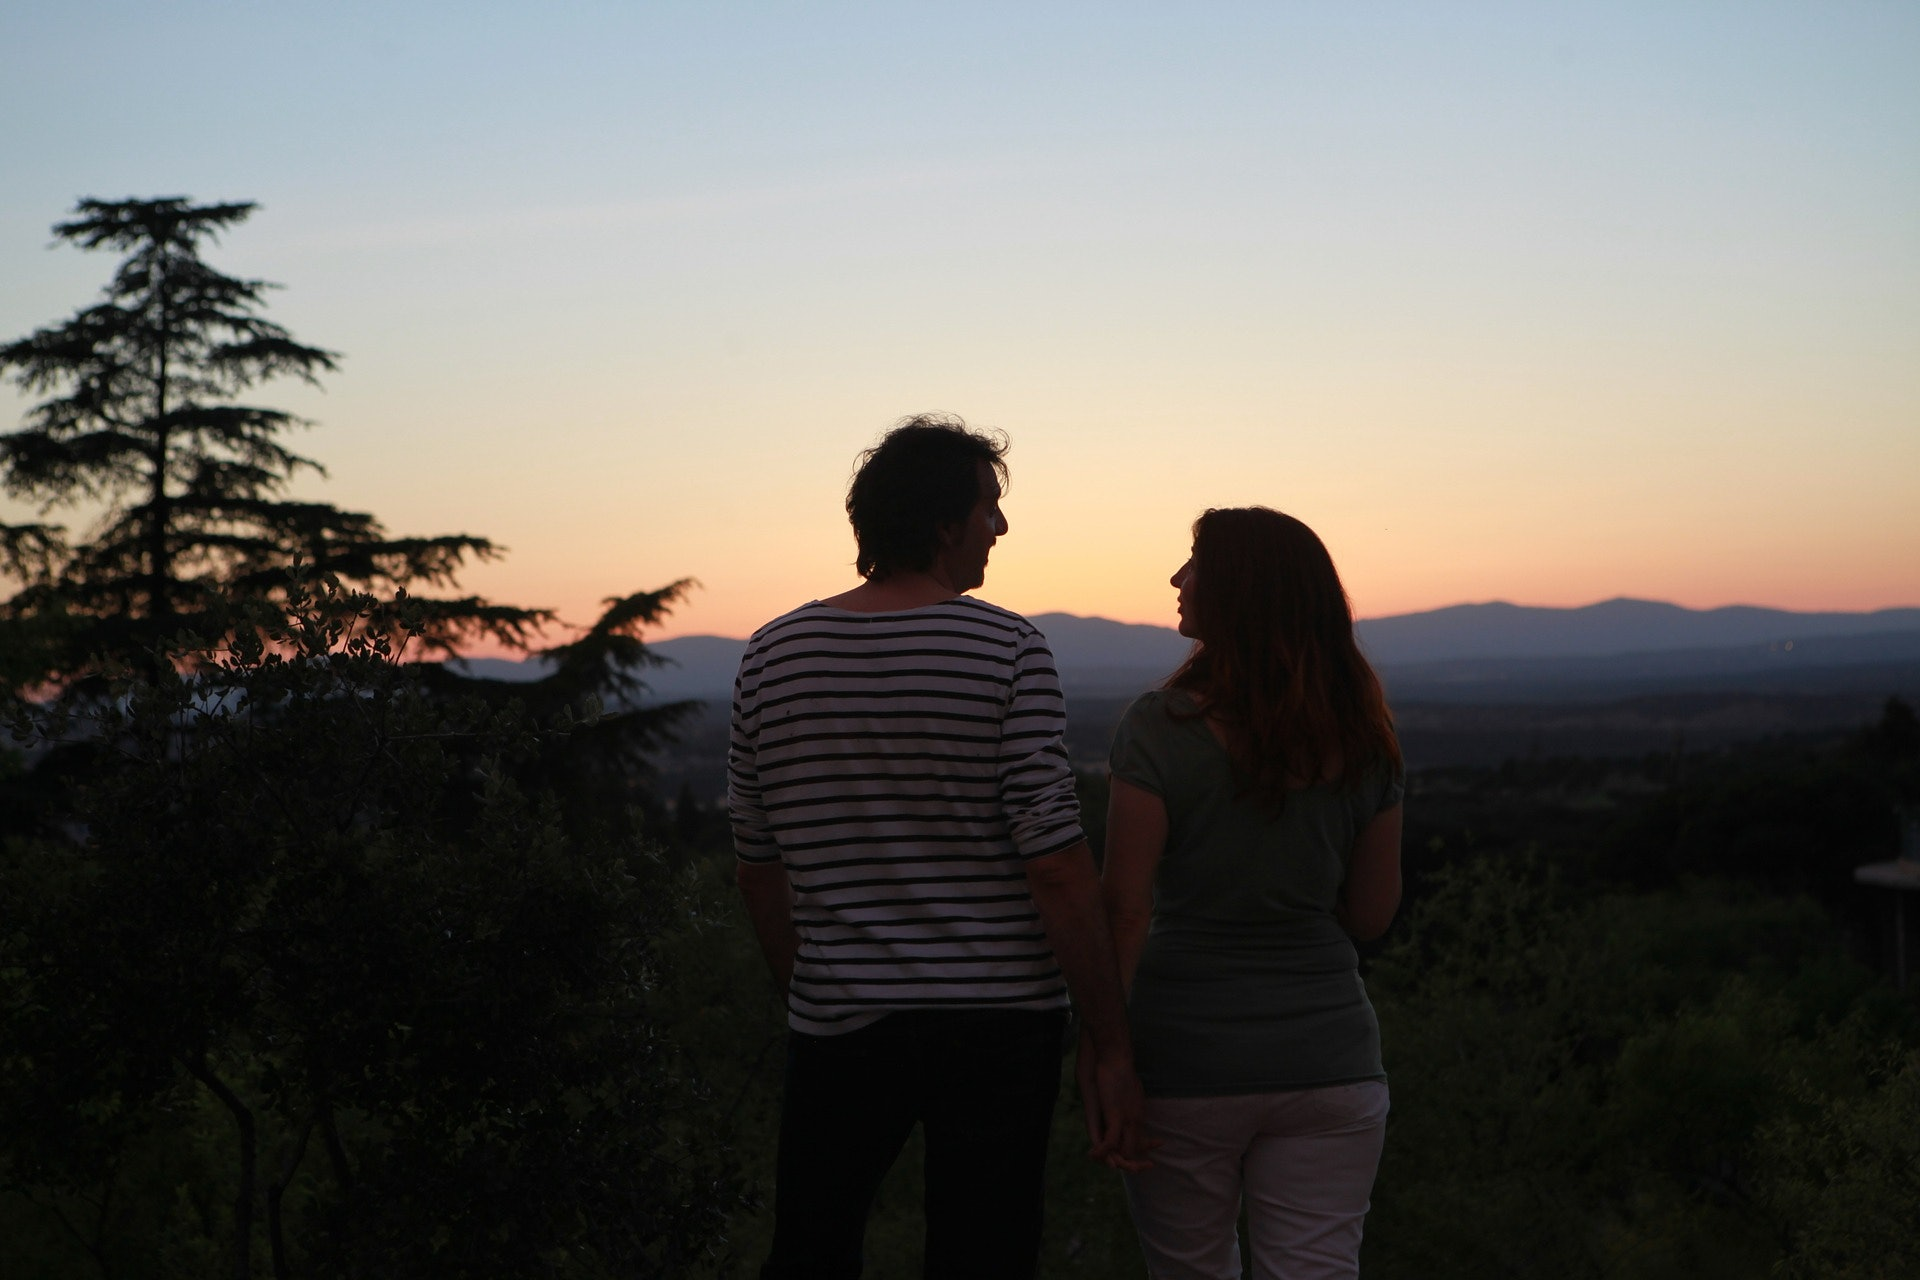 Free dating sites for non monogamous